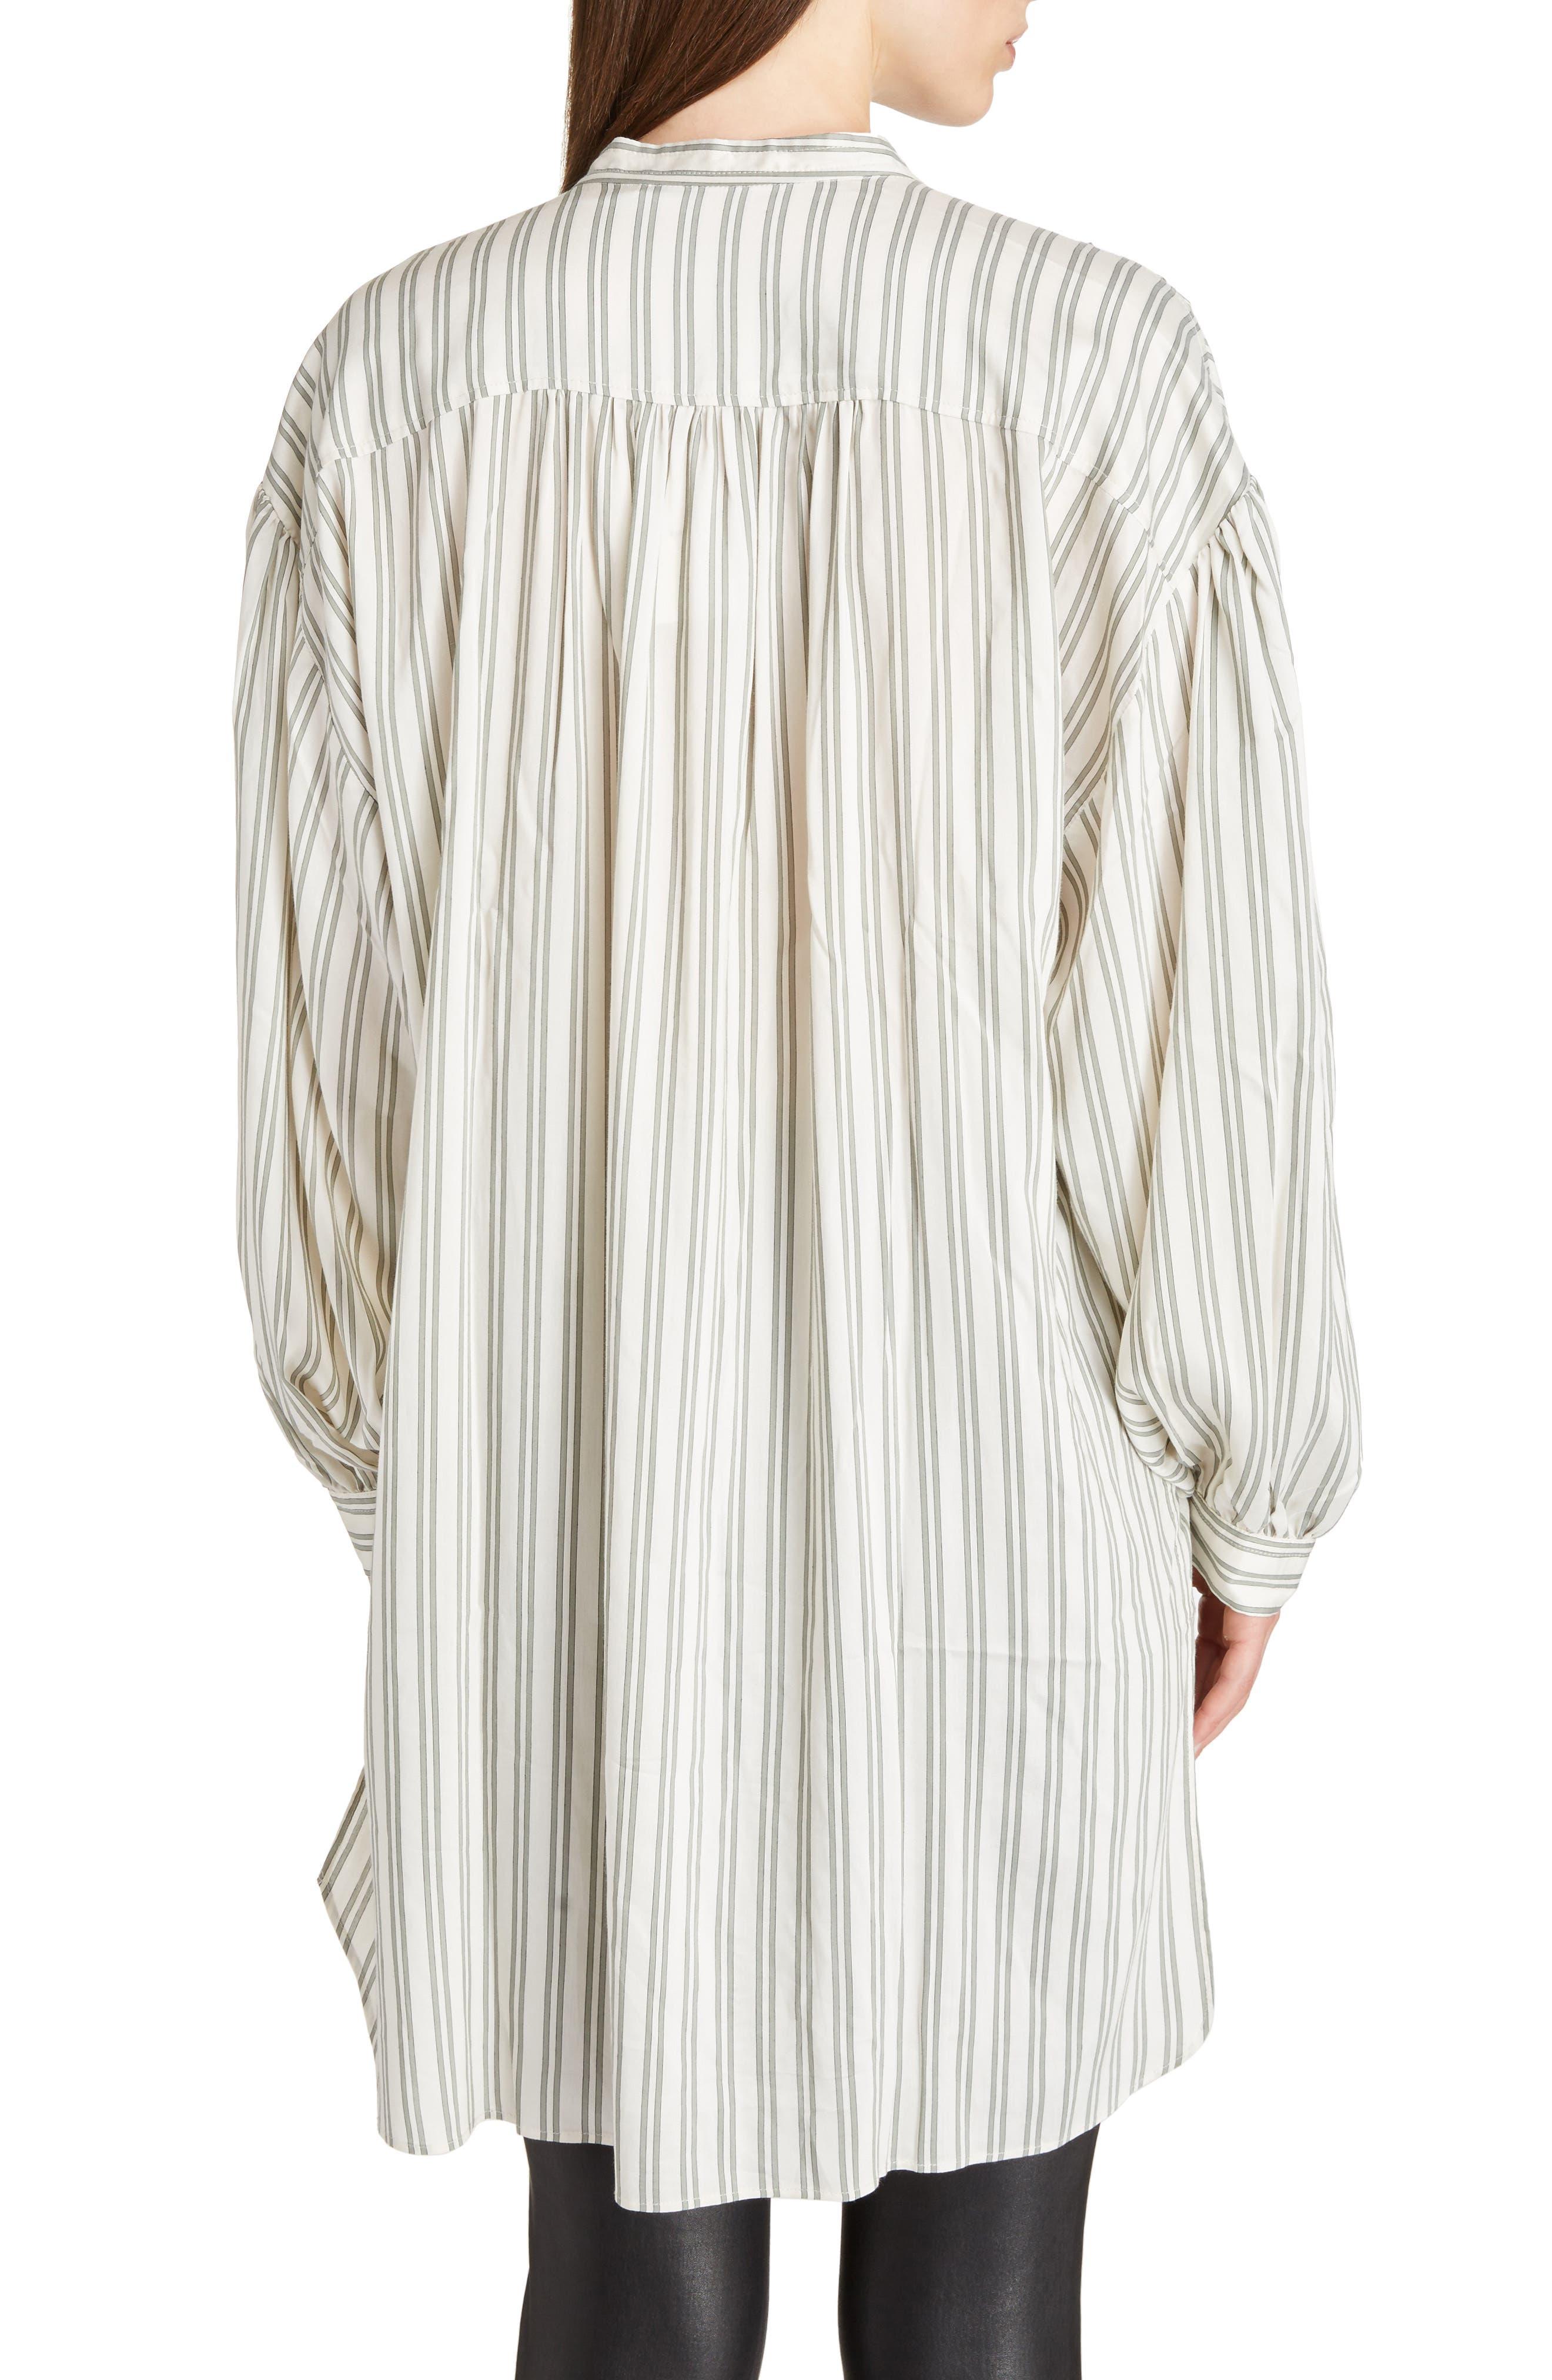 Idoa Stripe Tunic,                             Alternate thumbnail 2, color,                             100